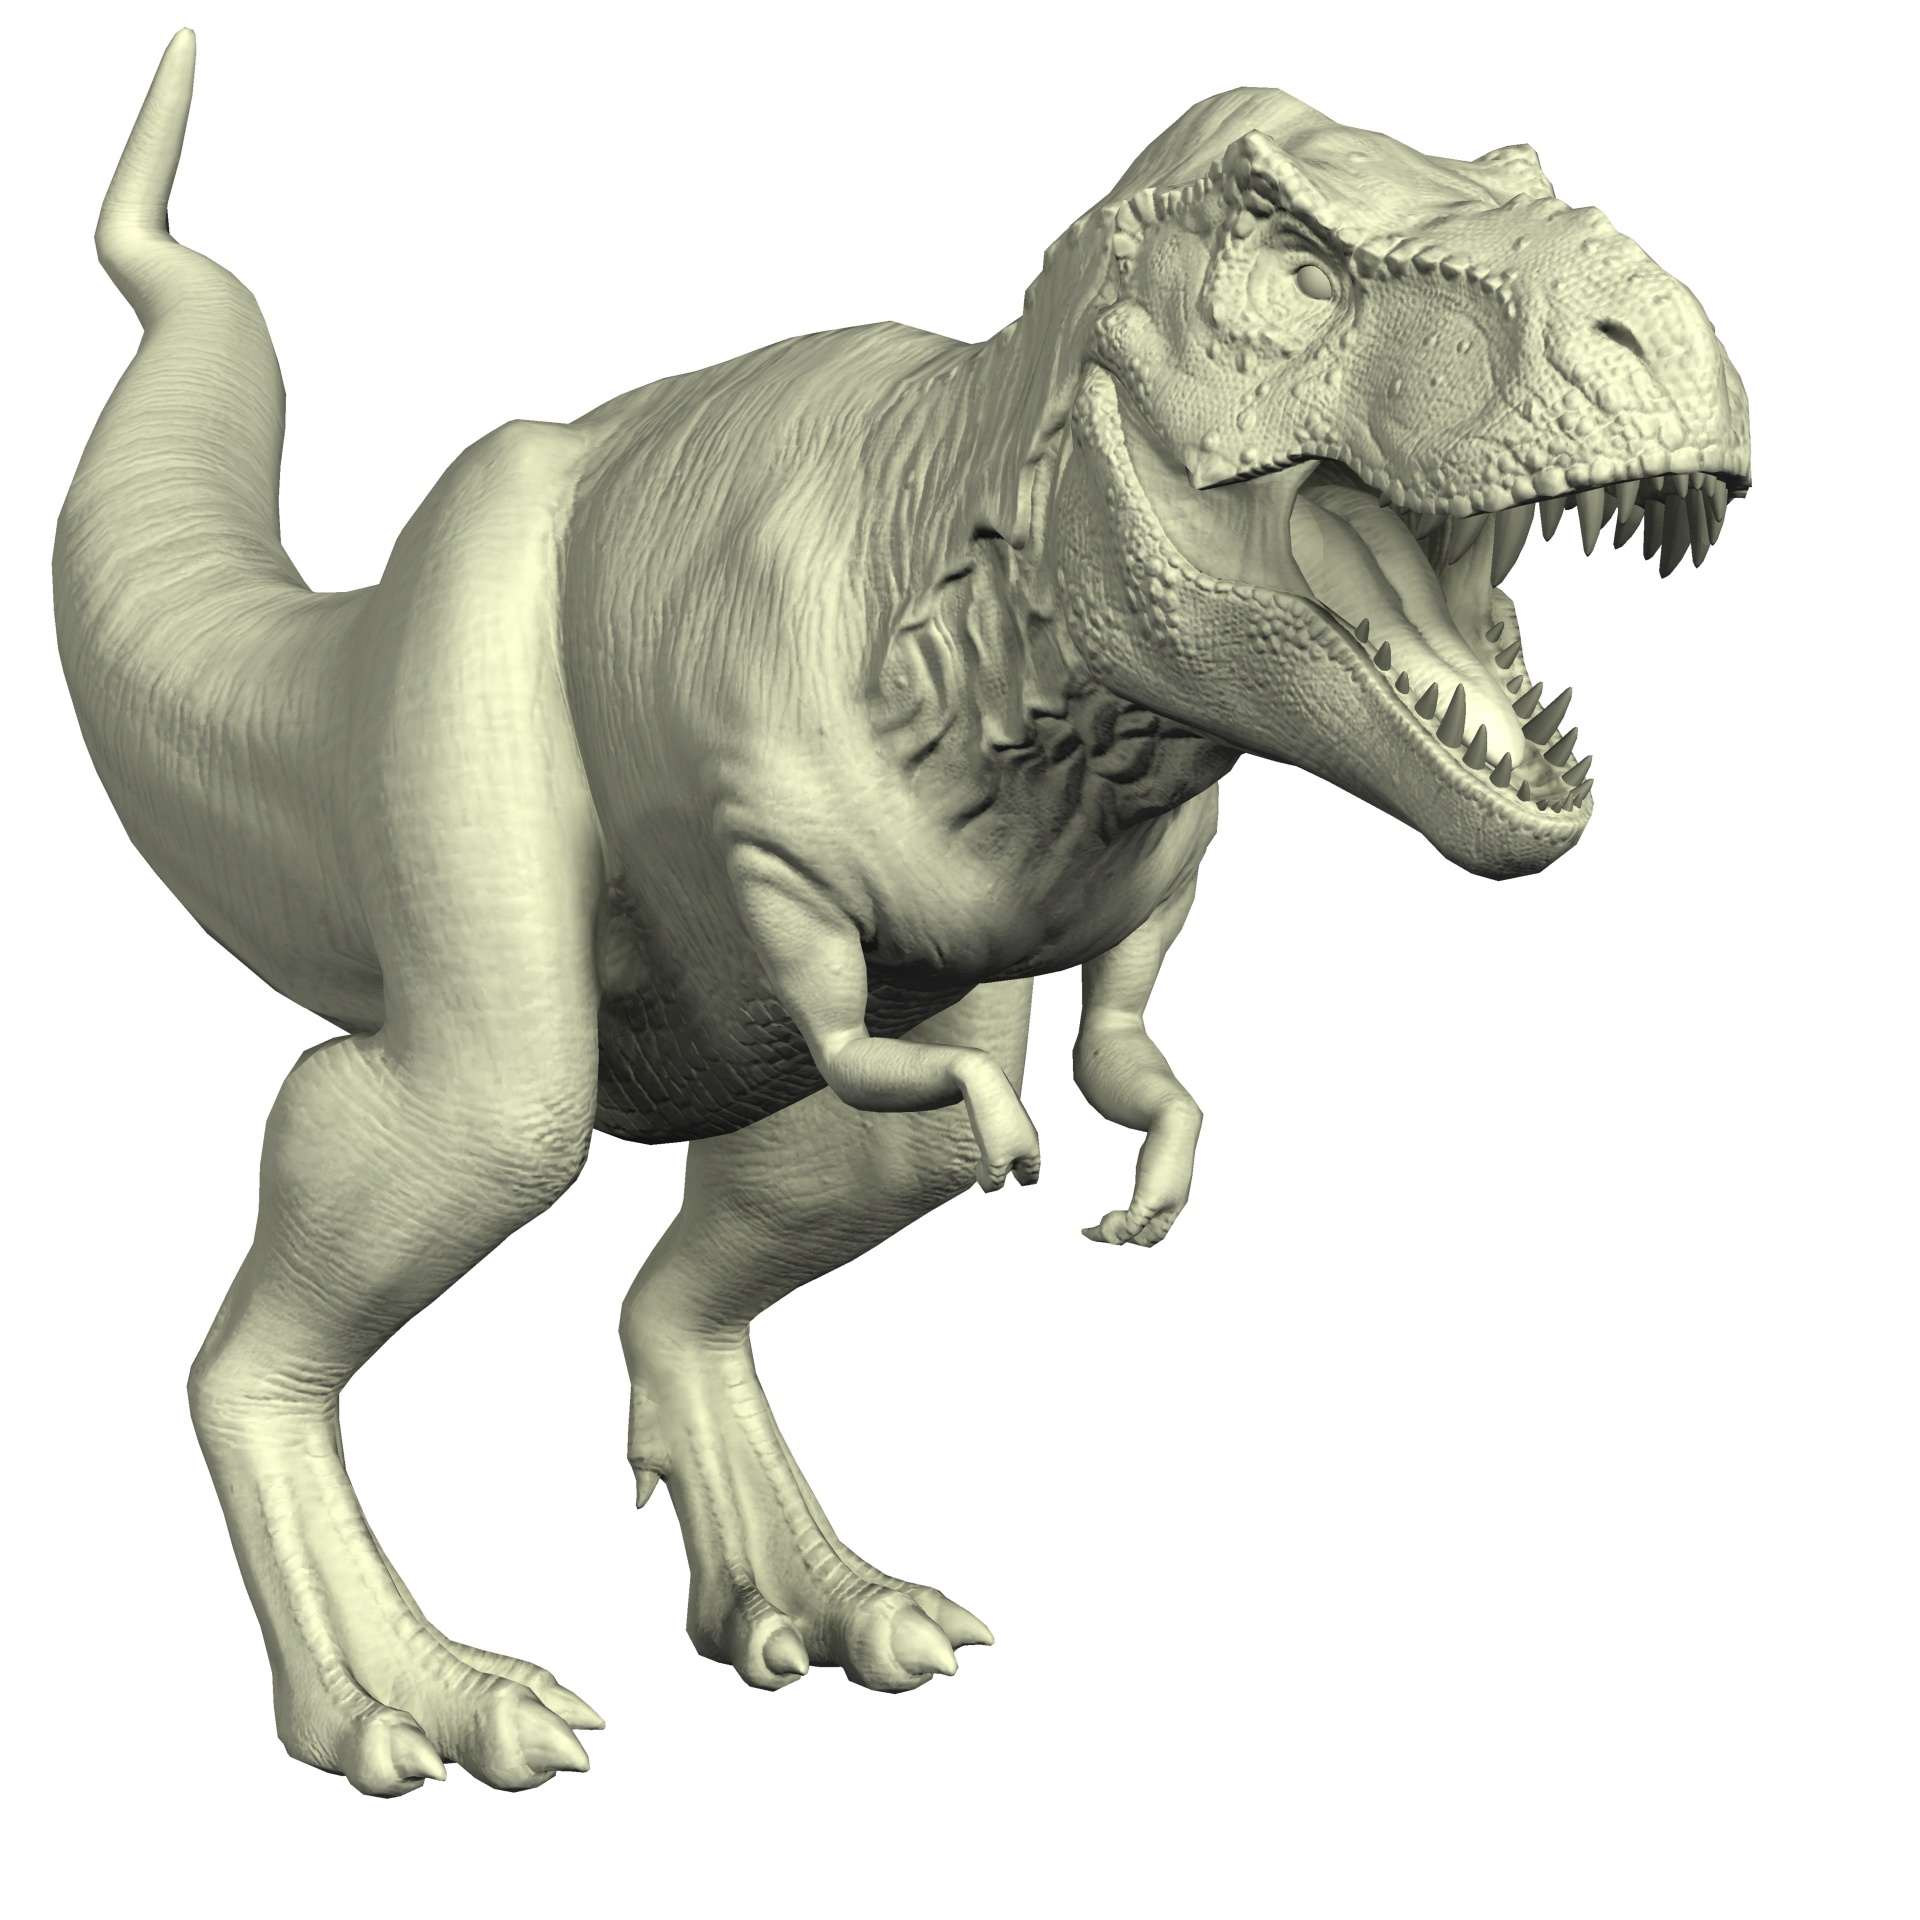 3d,drawing,cream,texture,t-rex - free photo from needpix com